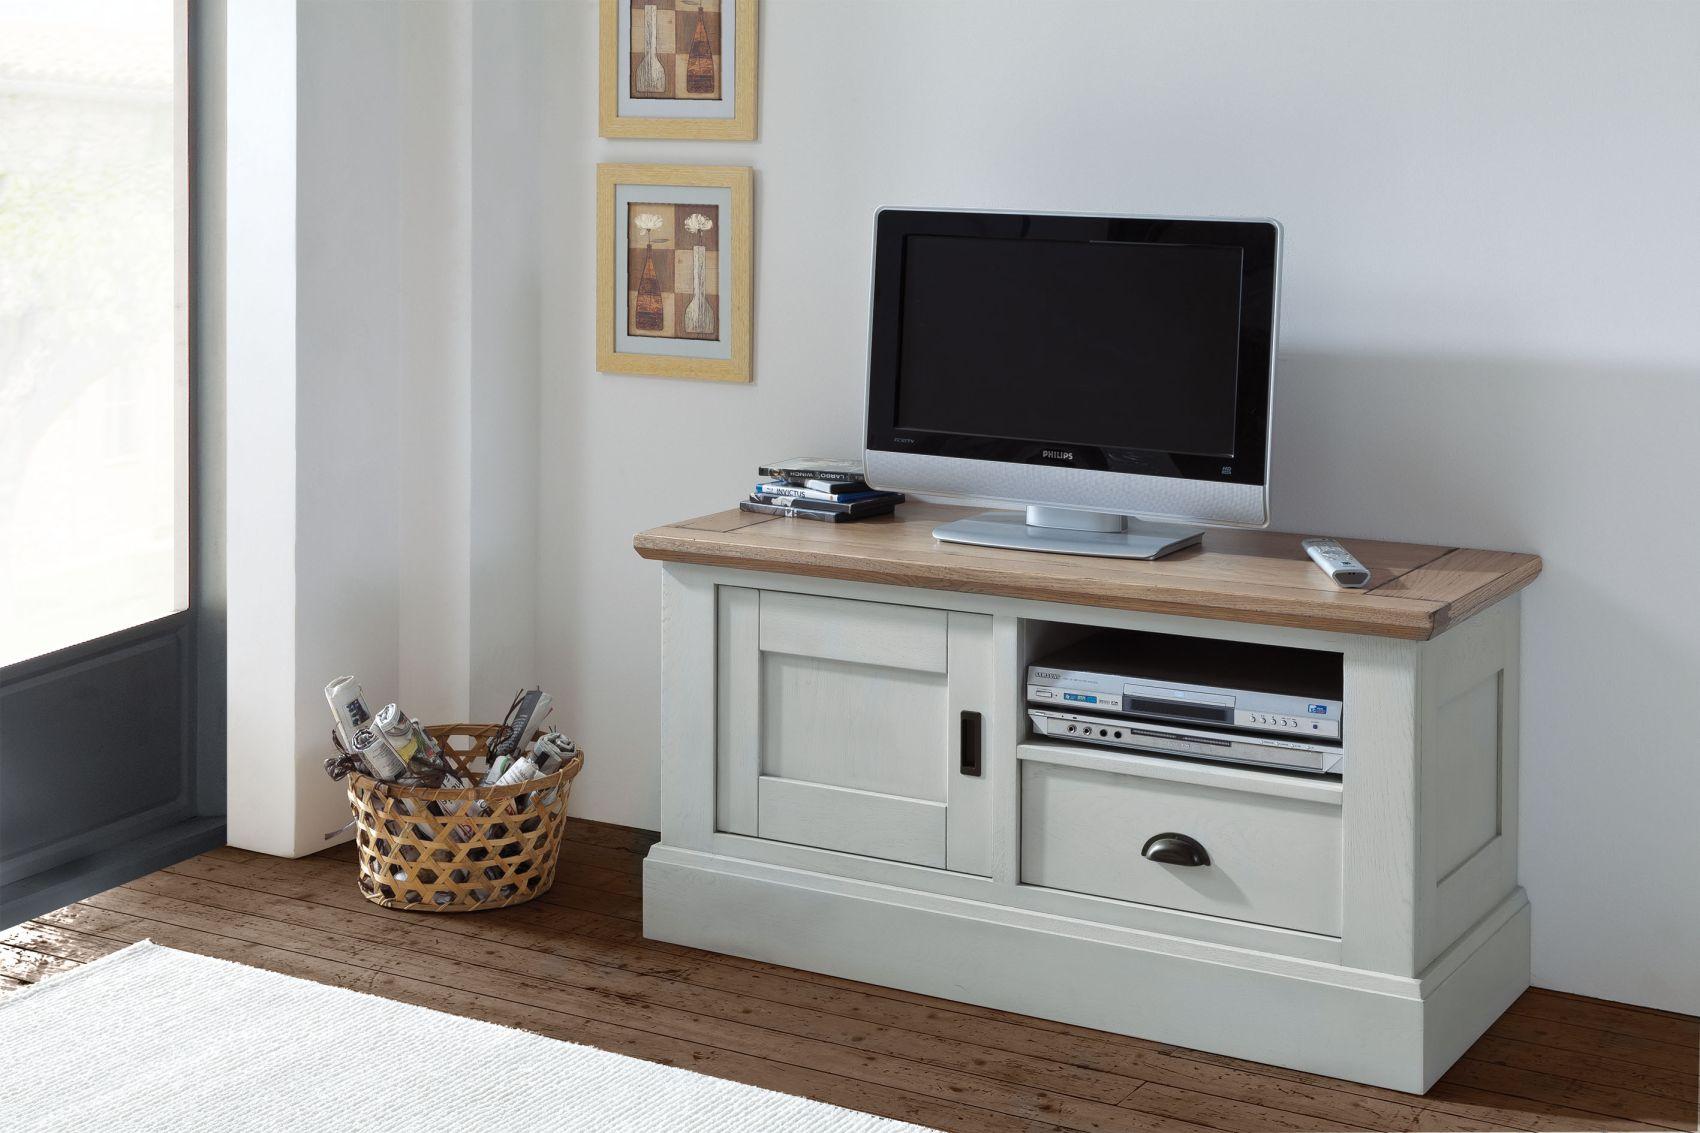 meuble tv romance mod le 2 meubles gibaud. Black Bedroom Furniture Sets. Home Design Ideas